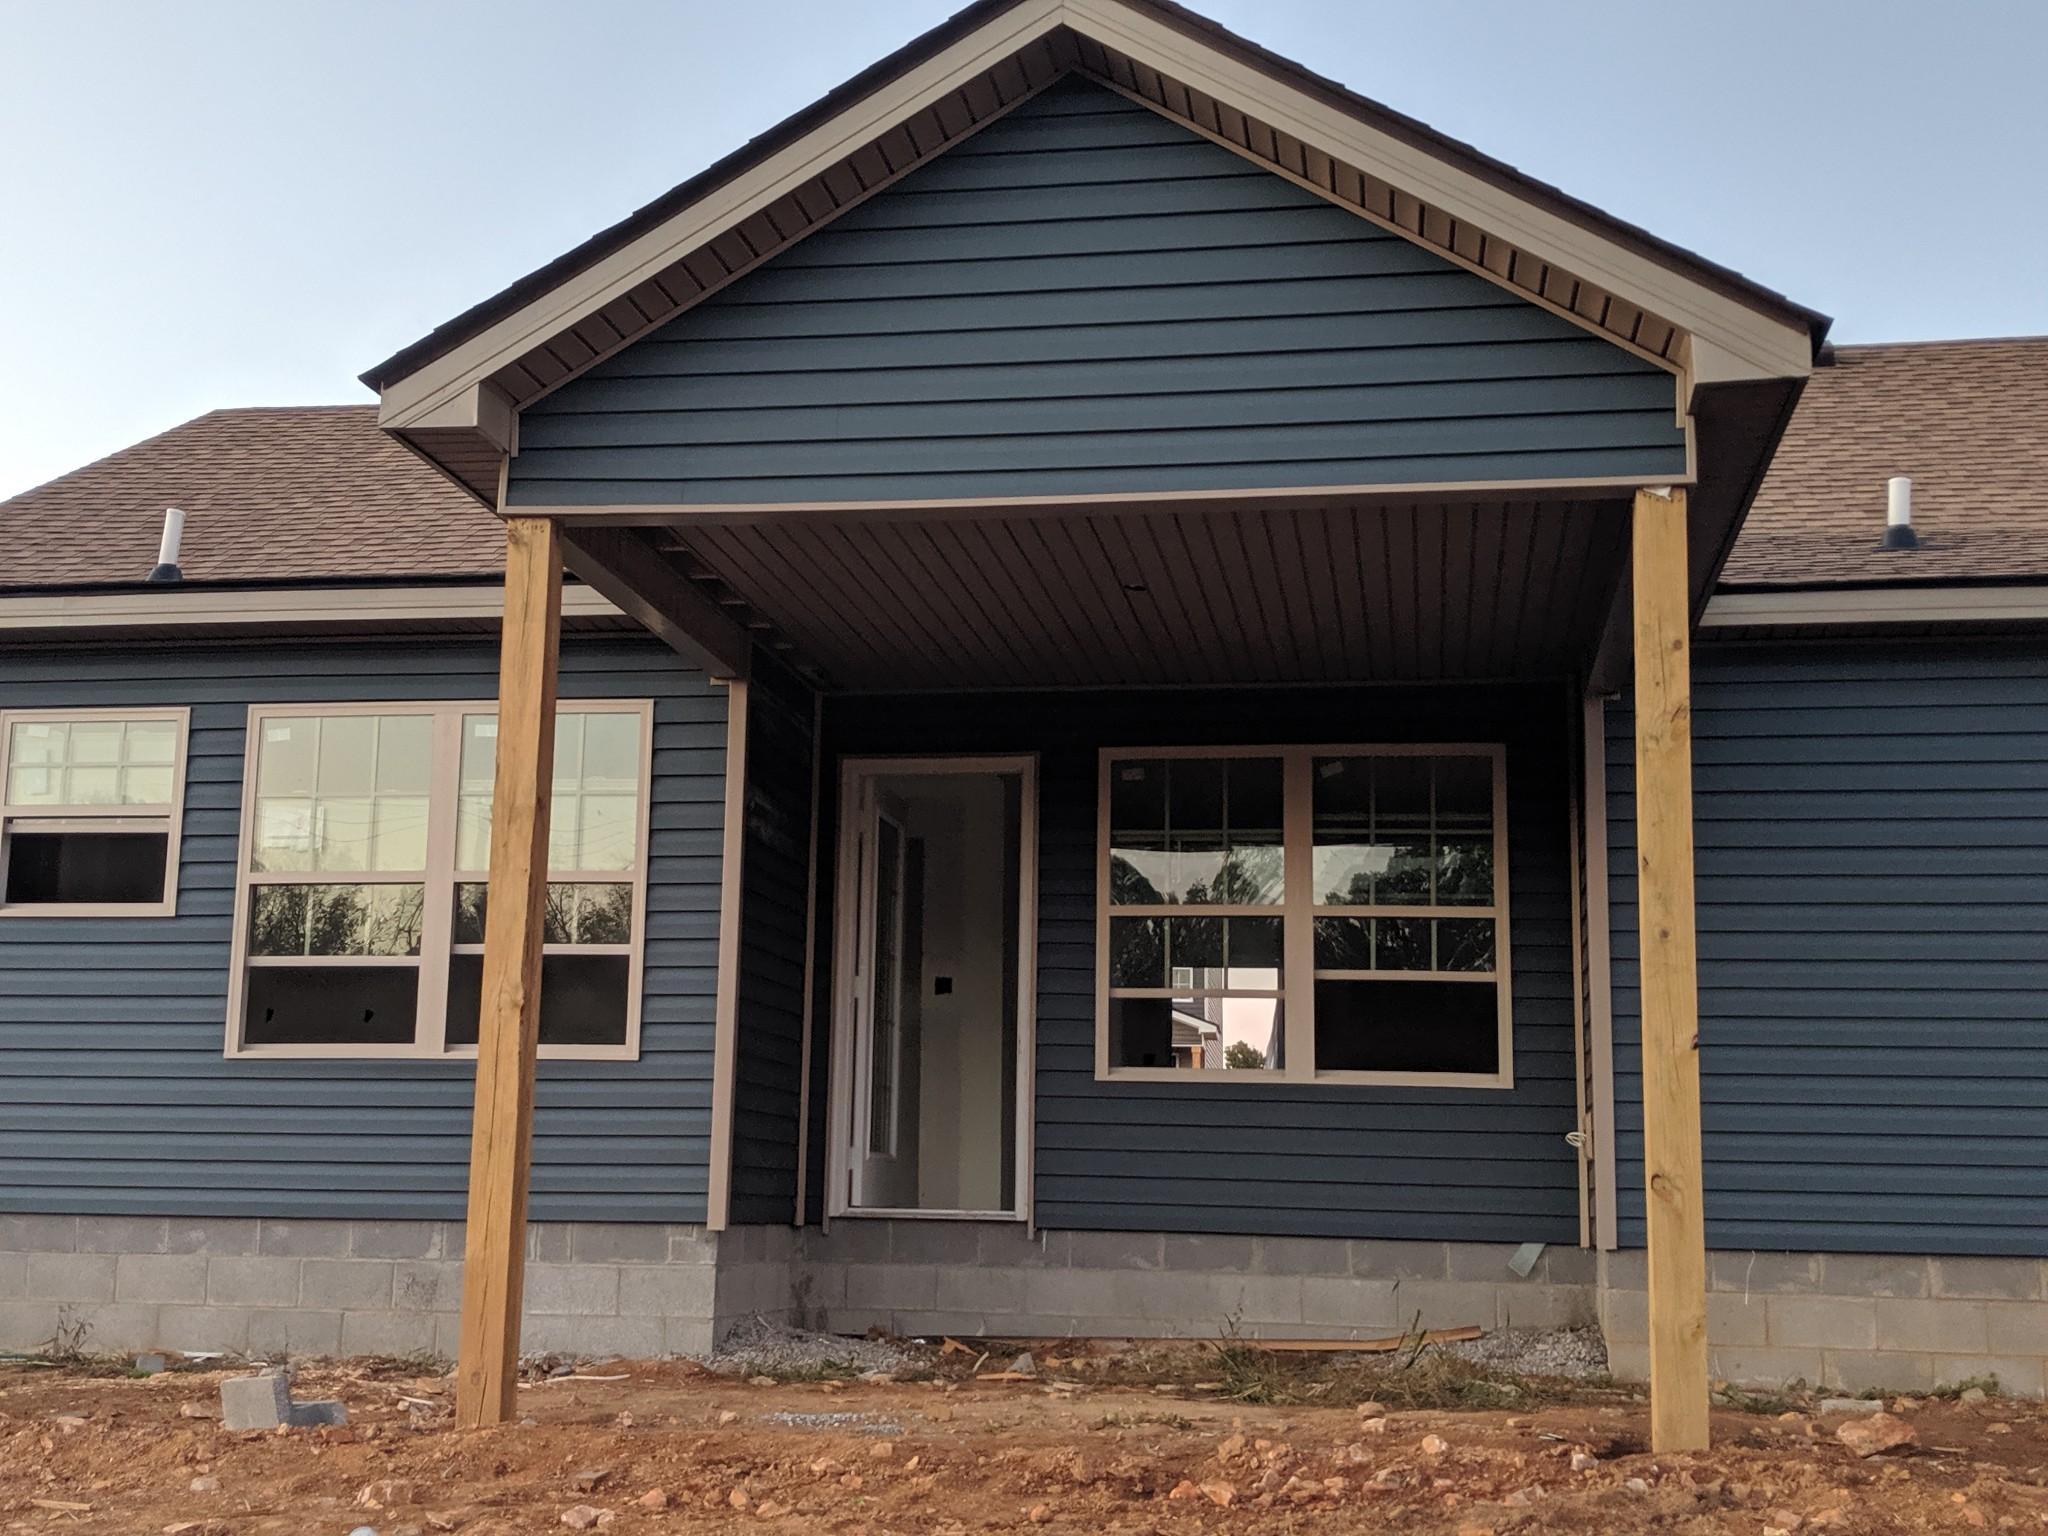 101 Rose Edd, Oak Grove, KY 42262 - Oak Grove, KY real estate listing